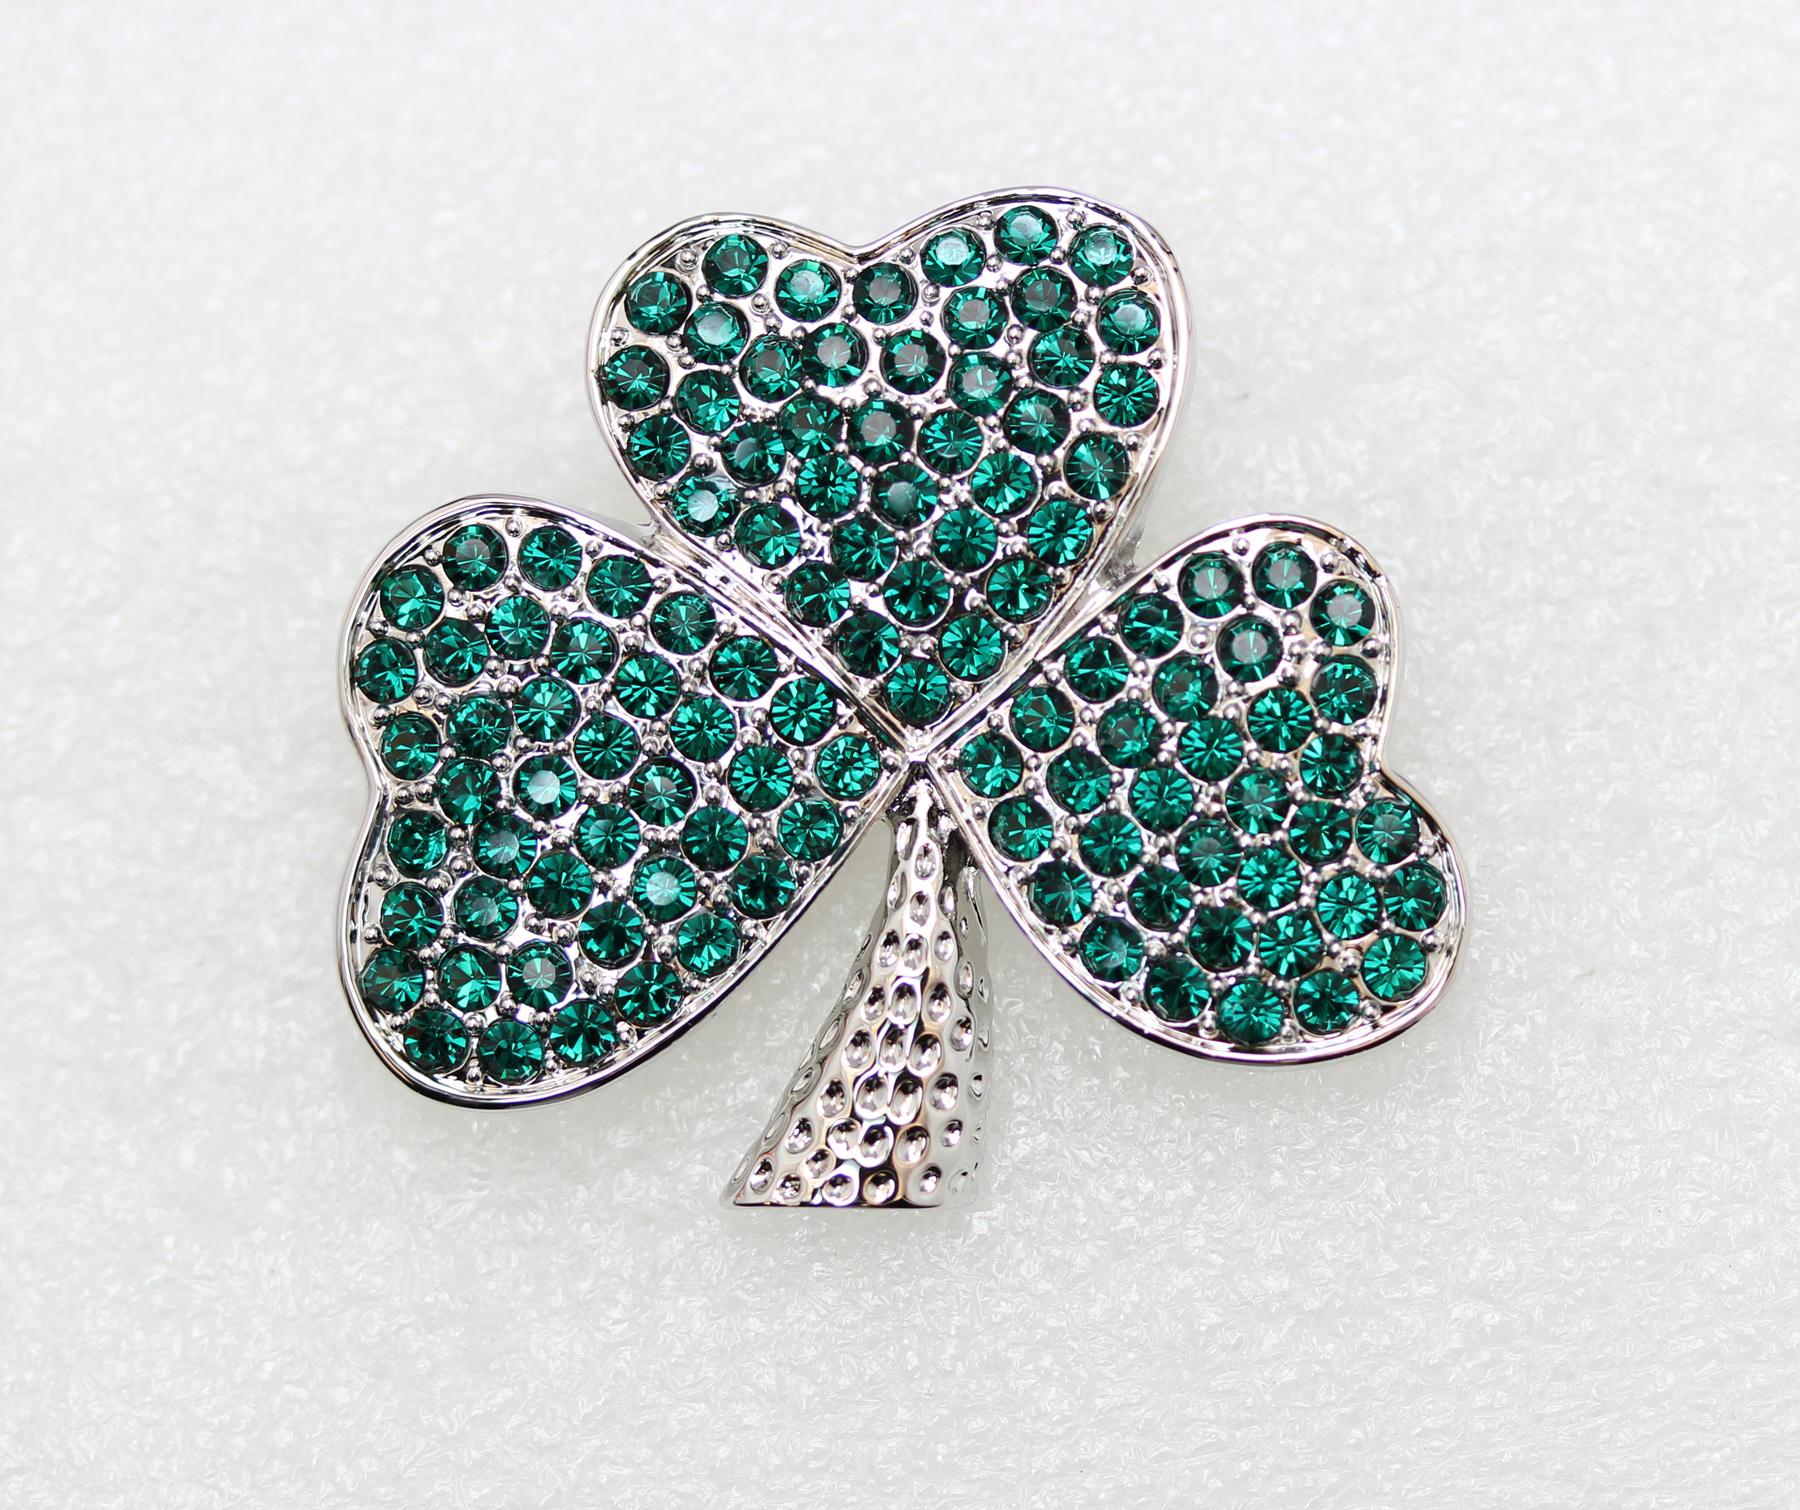 Emerald-Color-Green-Crystal-Shamrock-Clover-Leaf-Pin-Brooch-St-Patricks-Day thumbnail 8